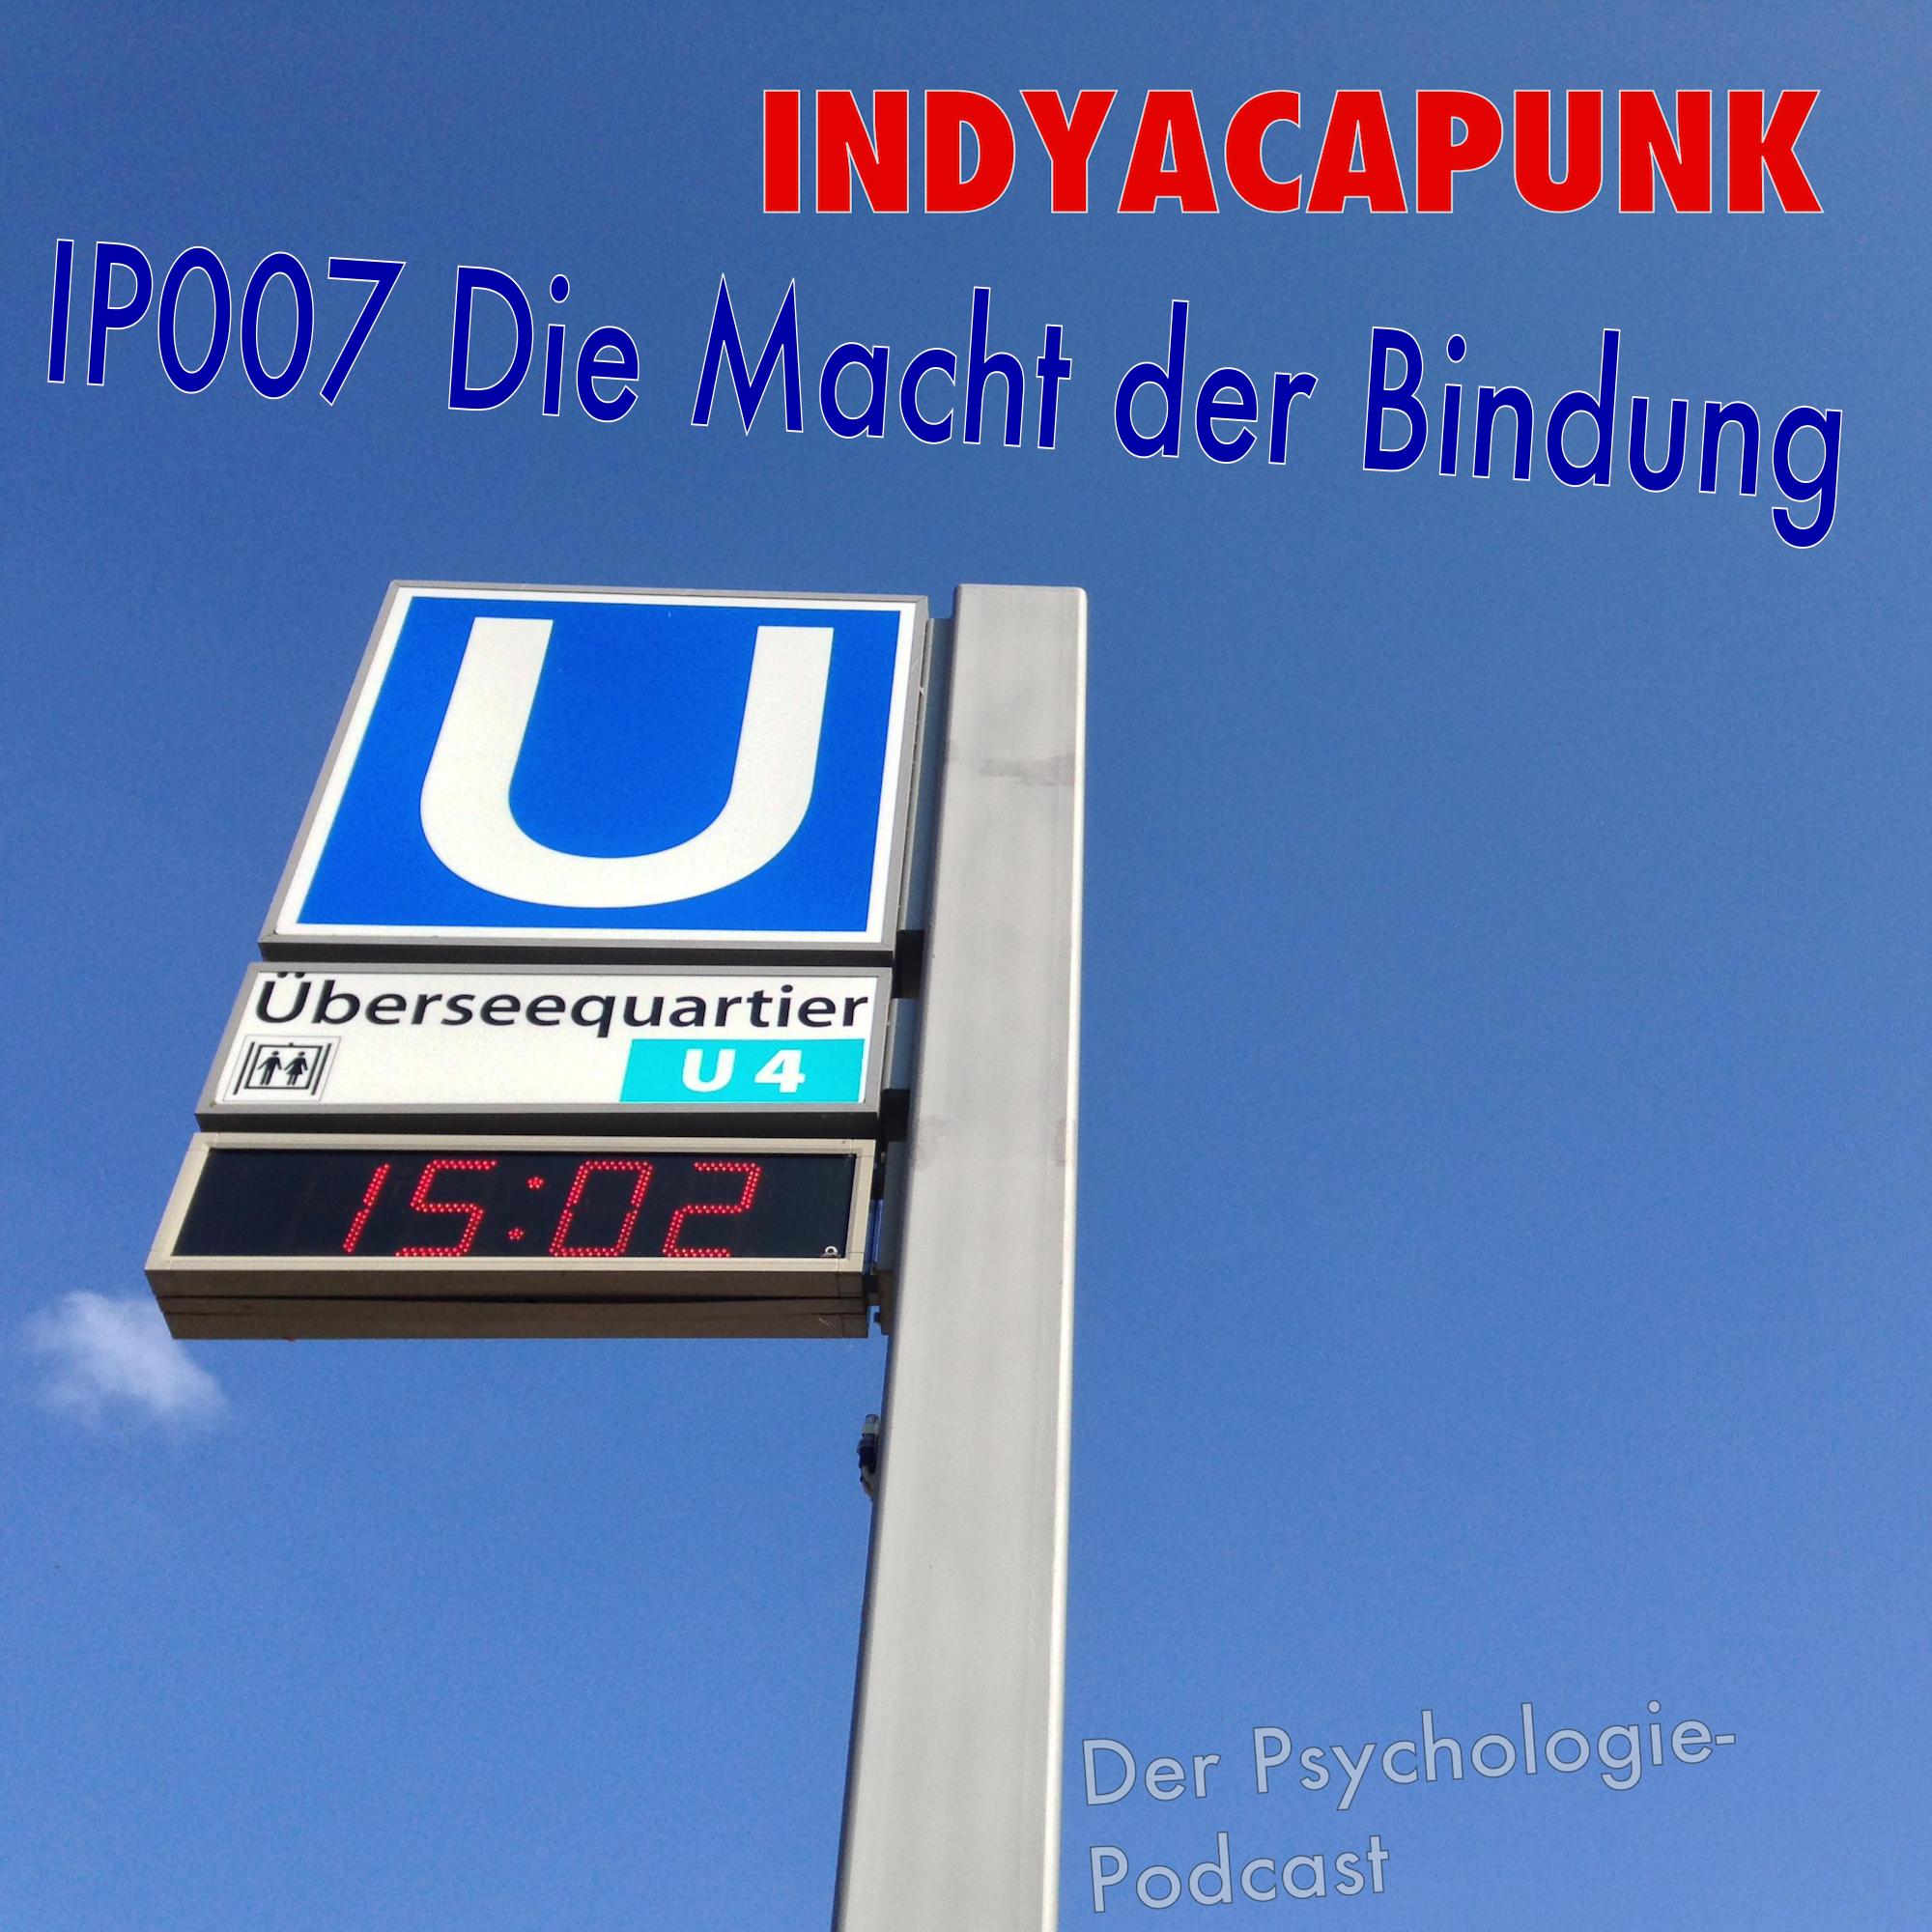 Online-dating-psychologie heute